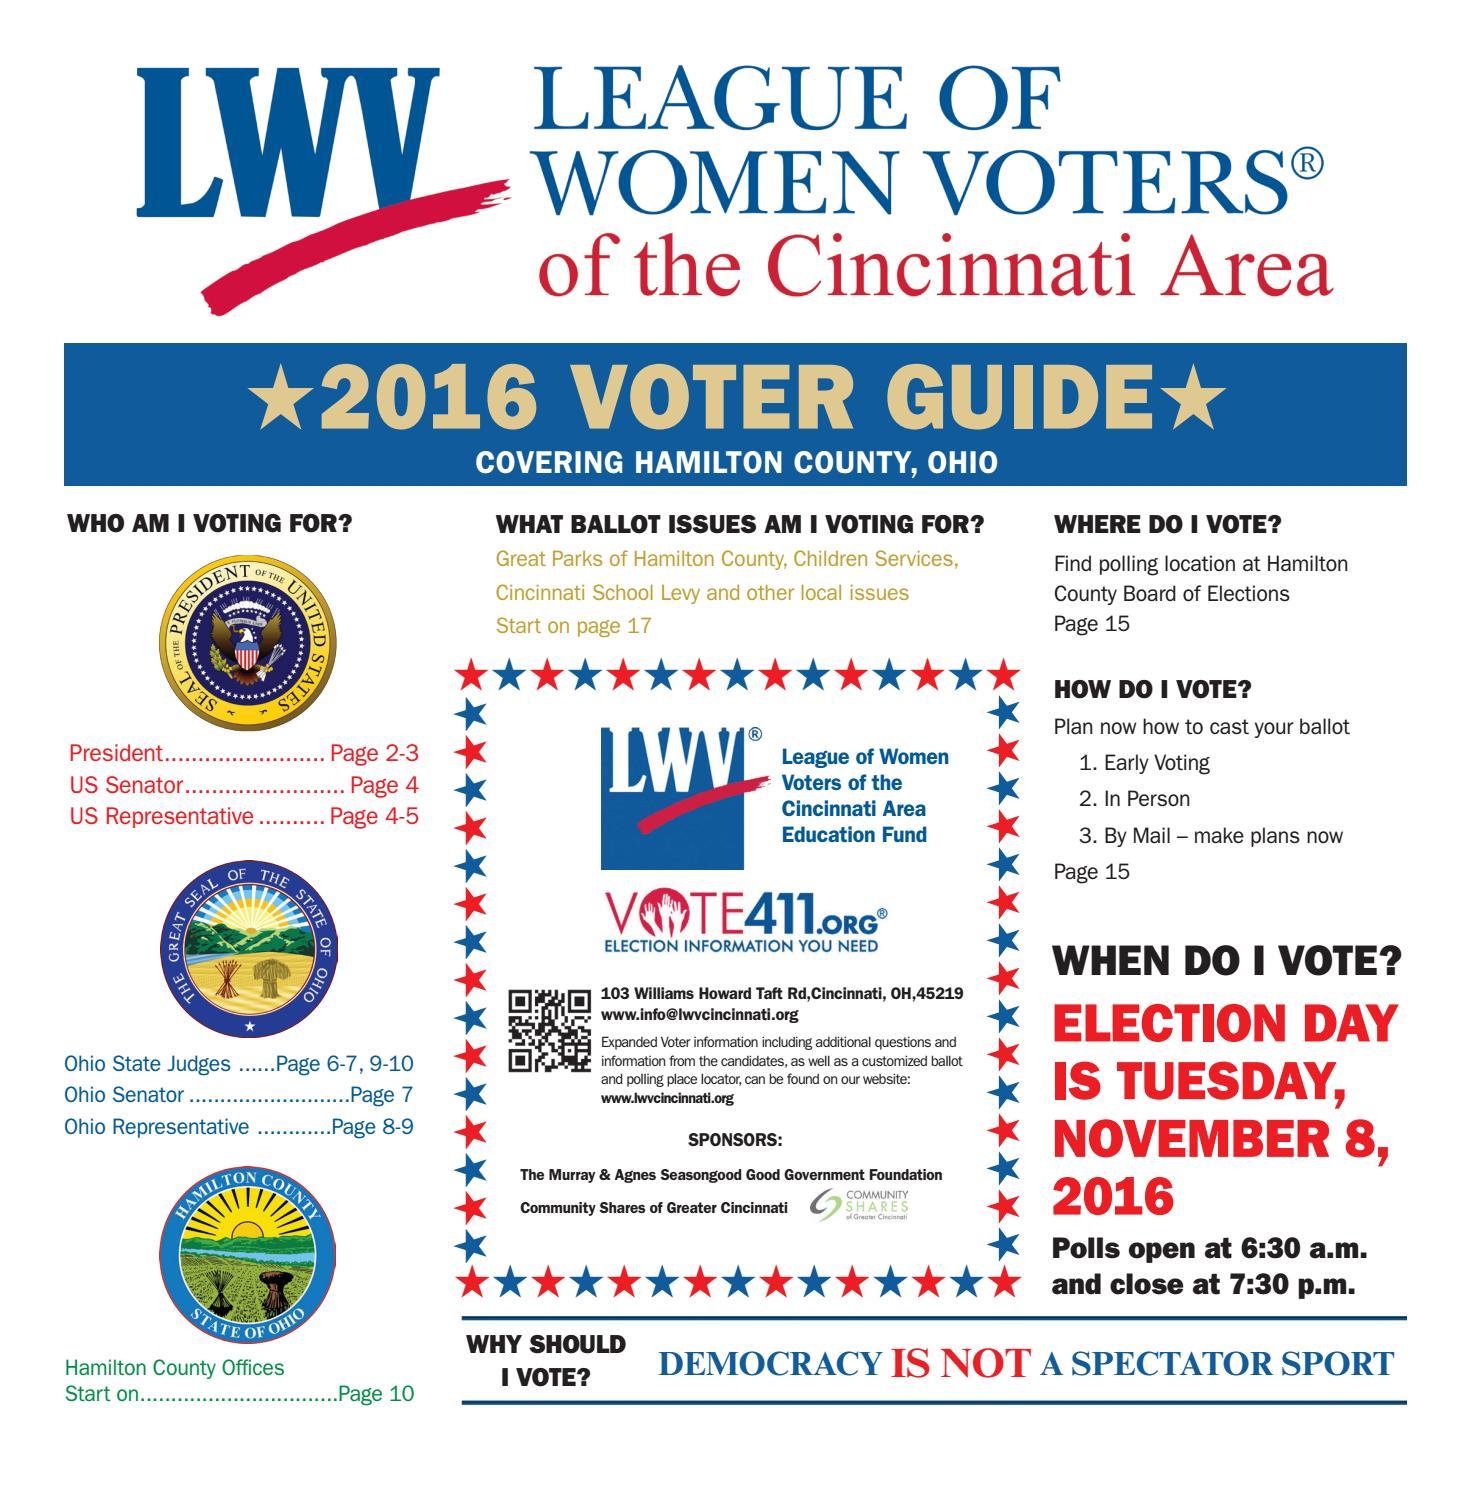 League of Women Voters 2016 Election Guide by Cincinnati ...